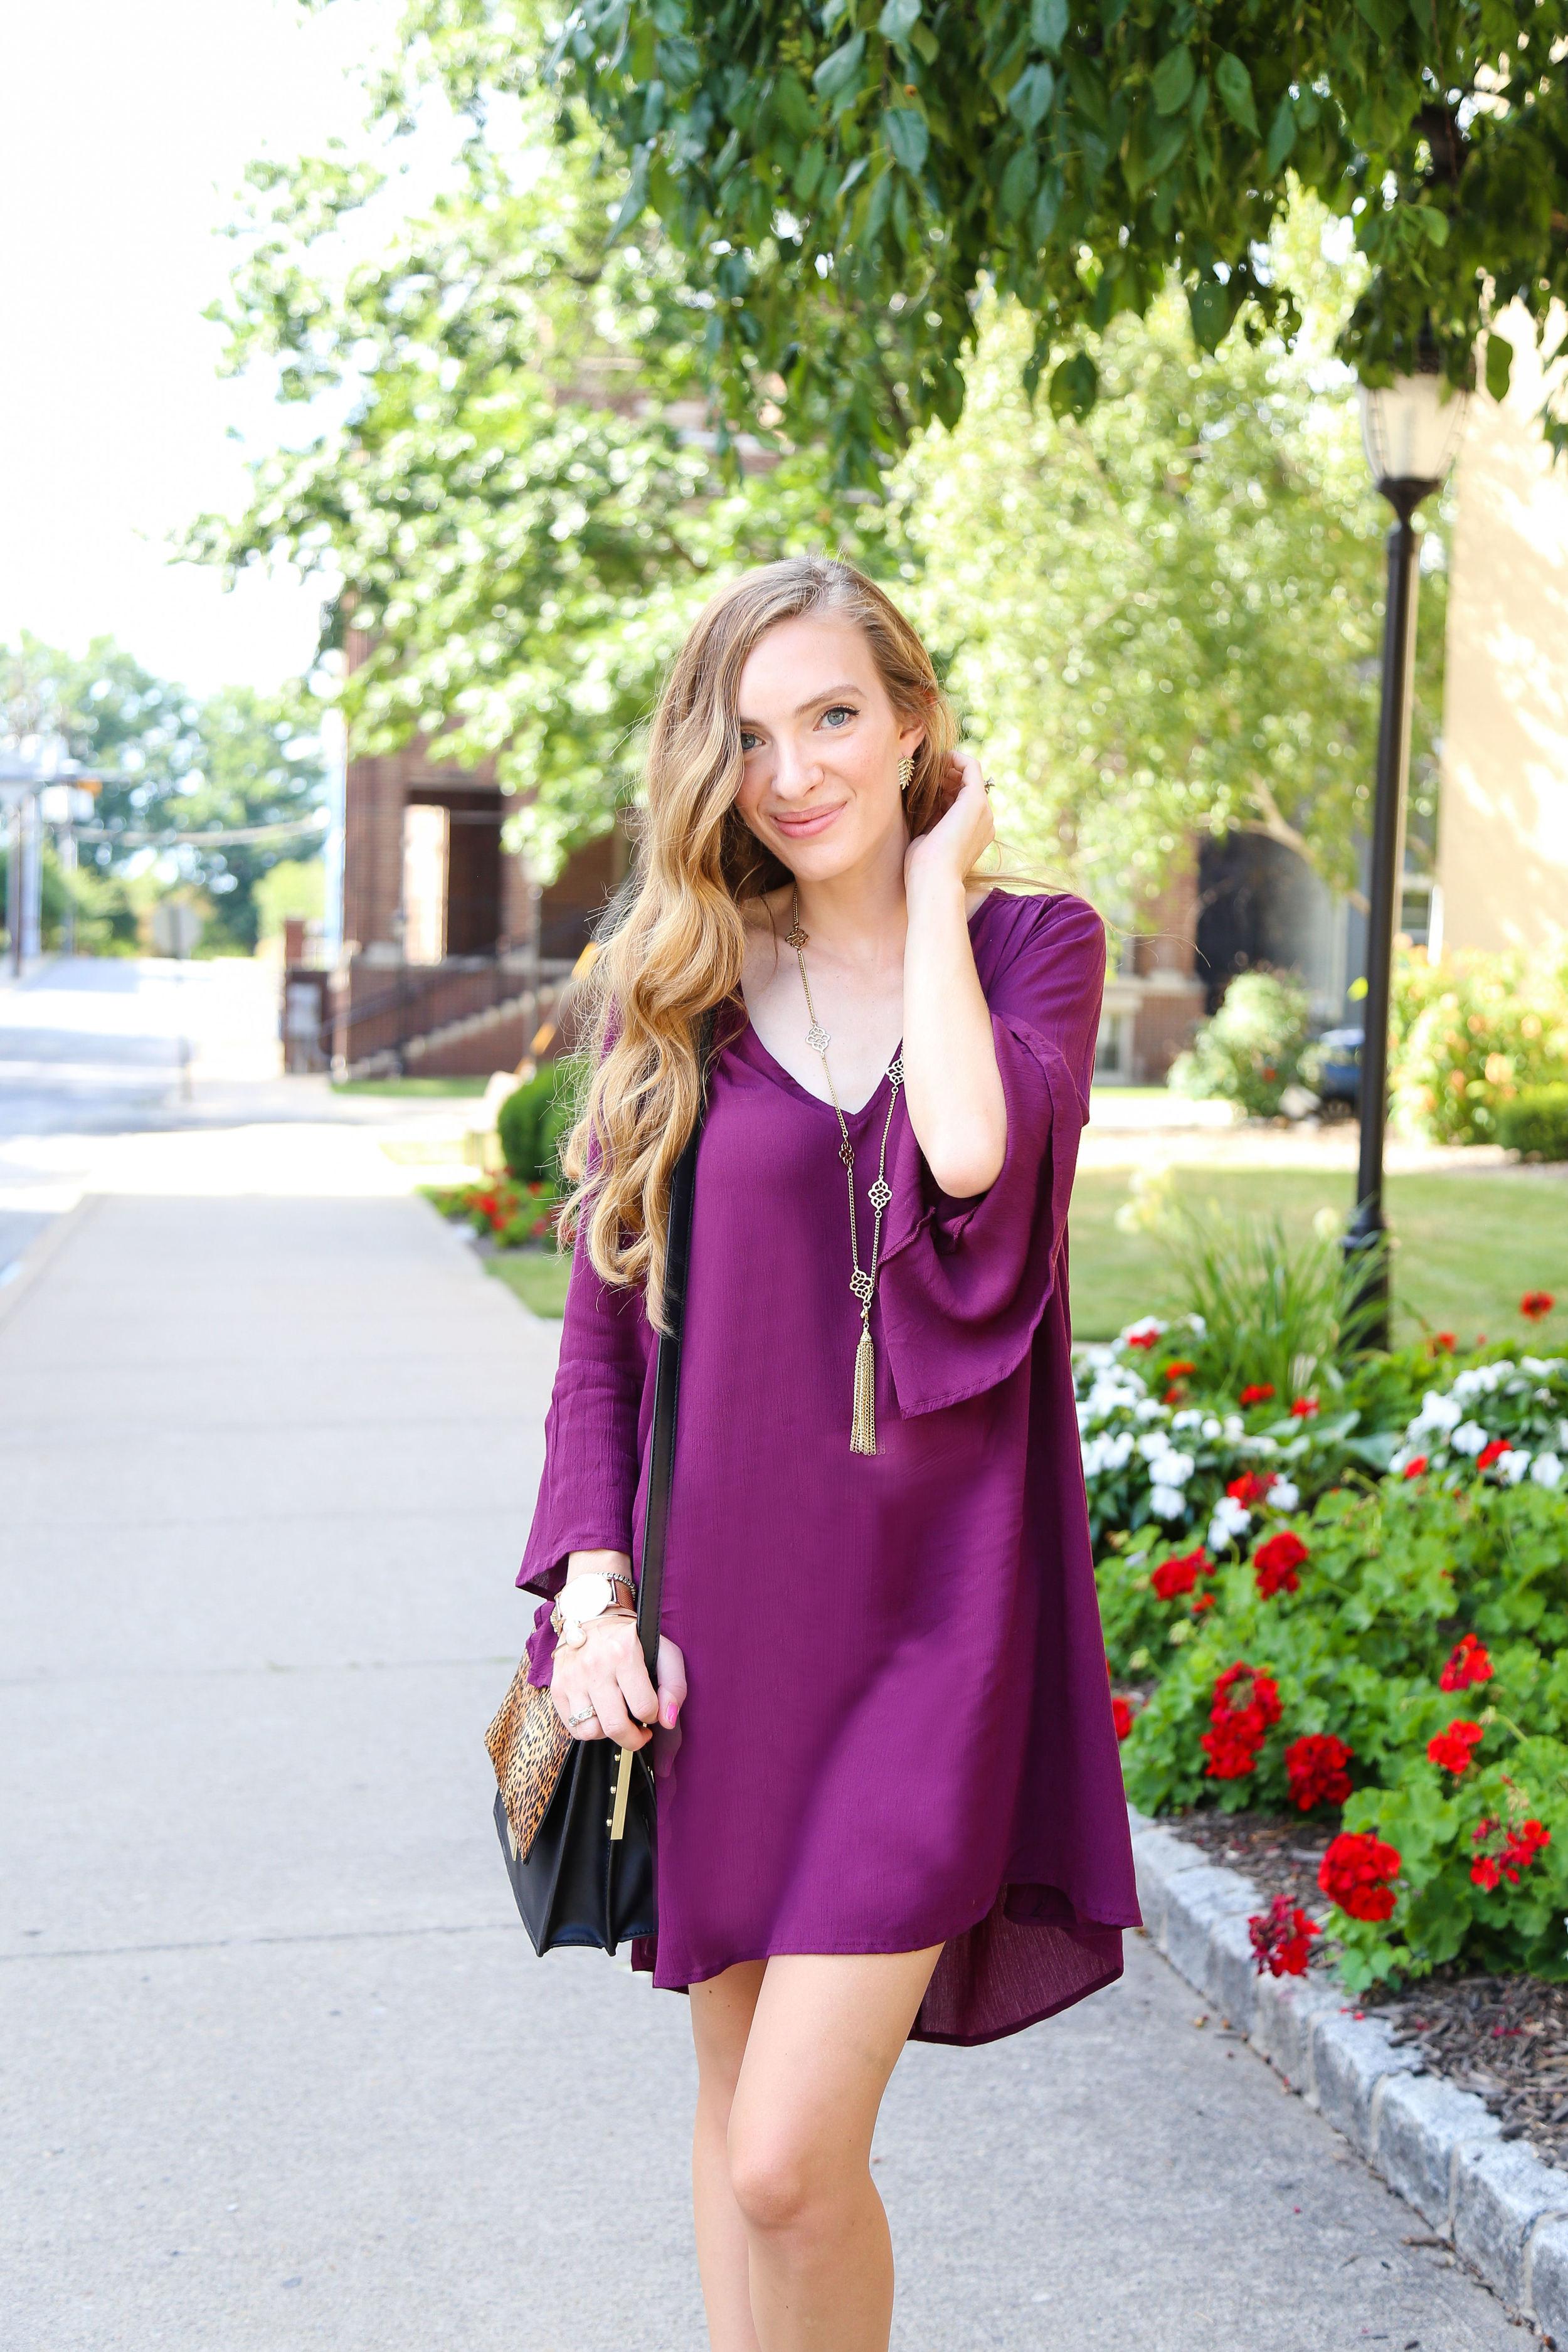 Bell Sleeve Dress- Enchanting Elegance